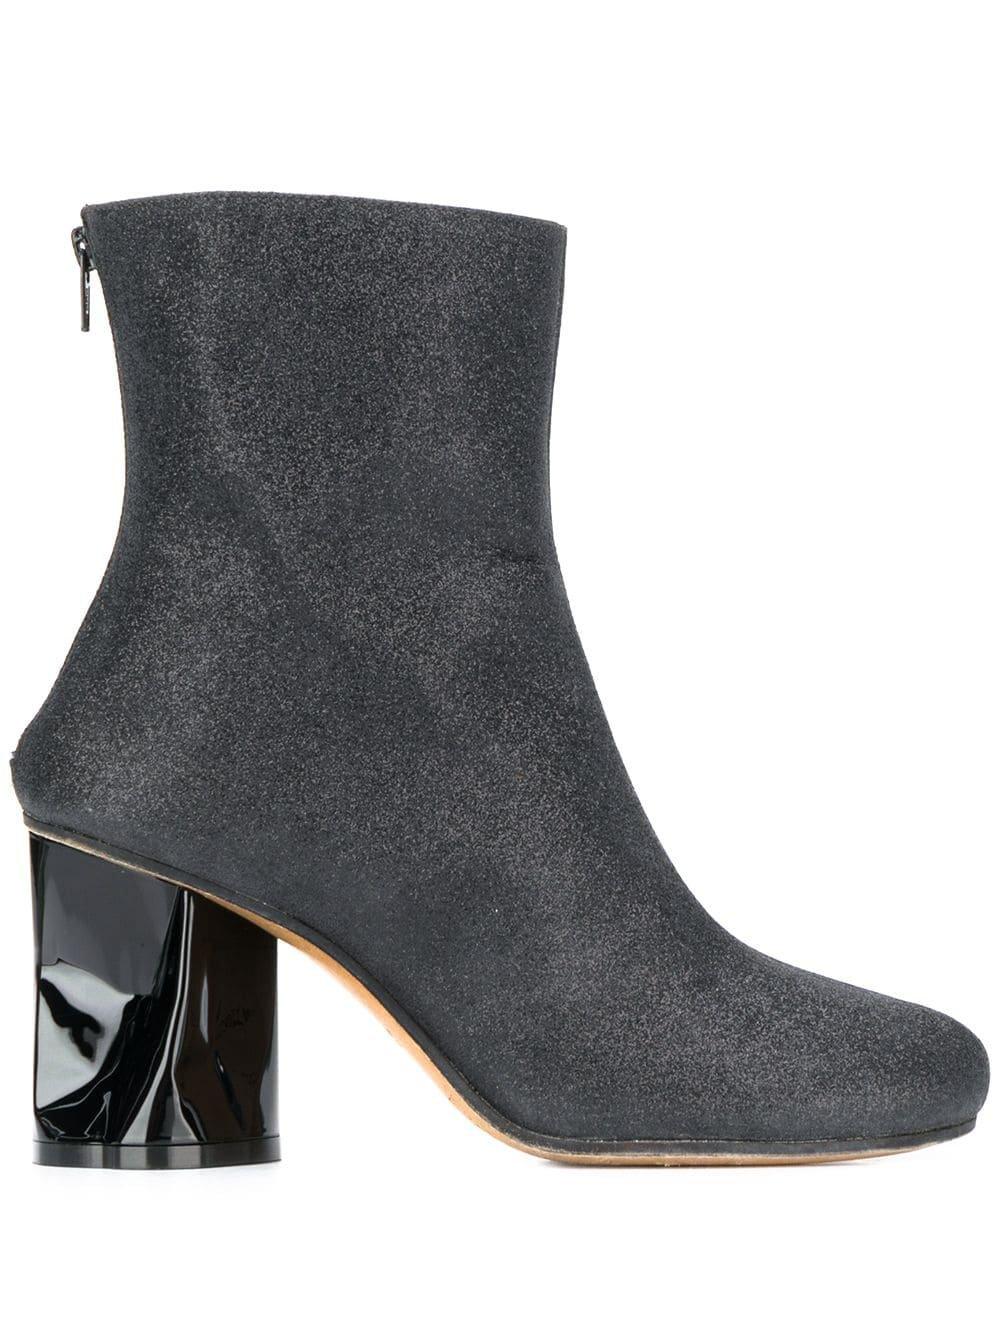 Maison Margiela Crushed Heel Ankle Boots - Farfetch